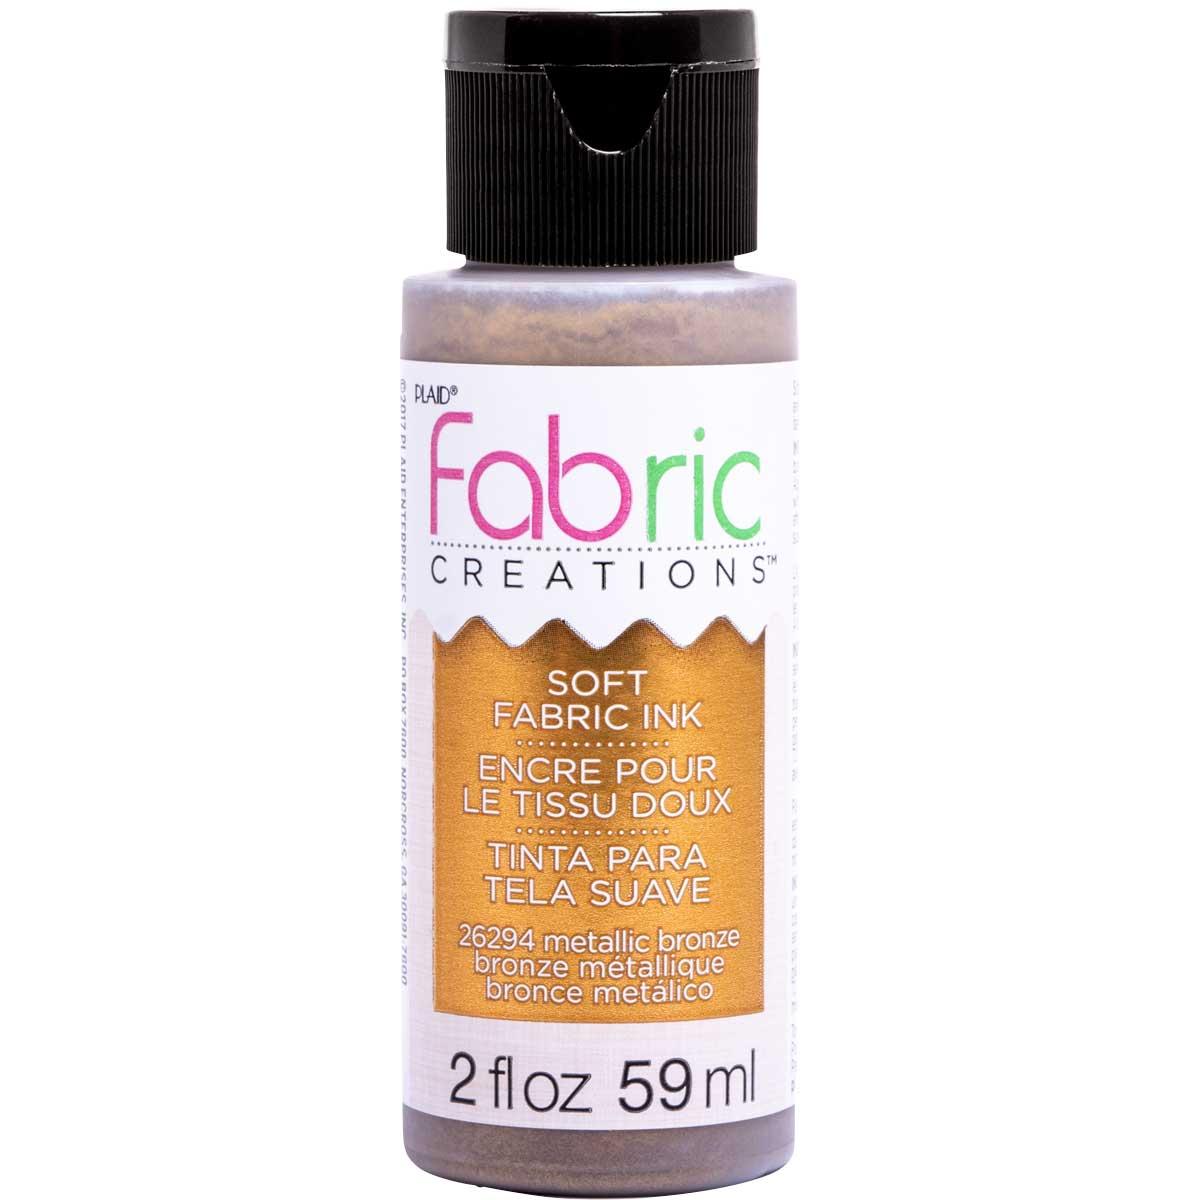 Fabric Creations™ Soft Fabric Inks - Metallic Bronze, 2 oz. - 26294